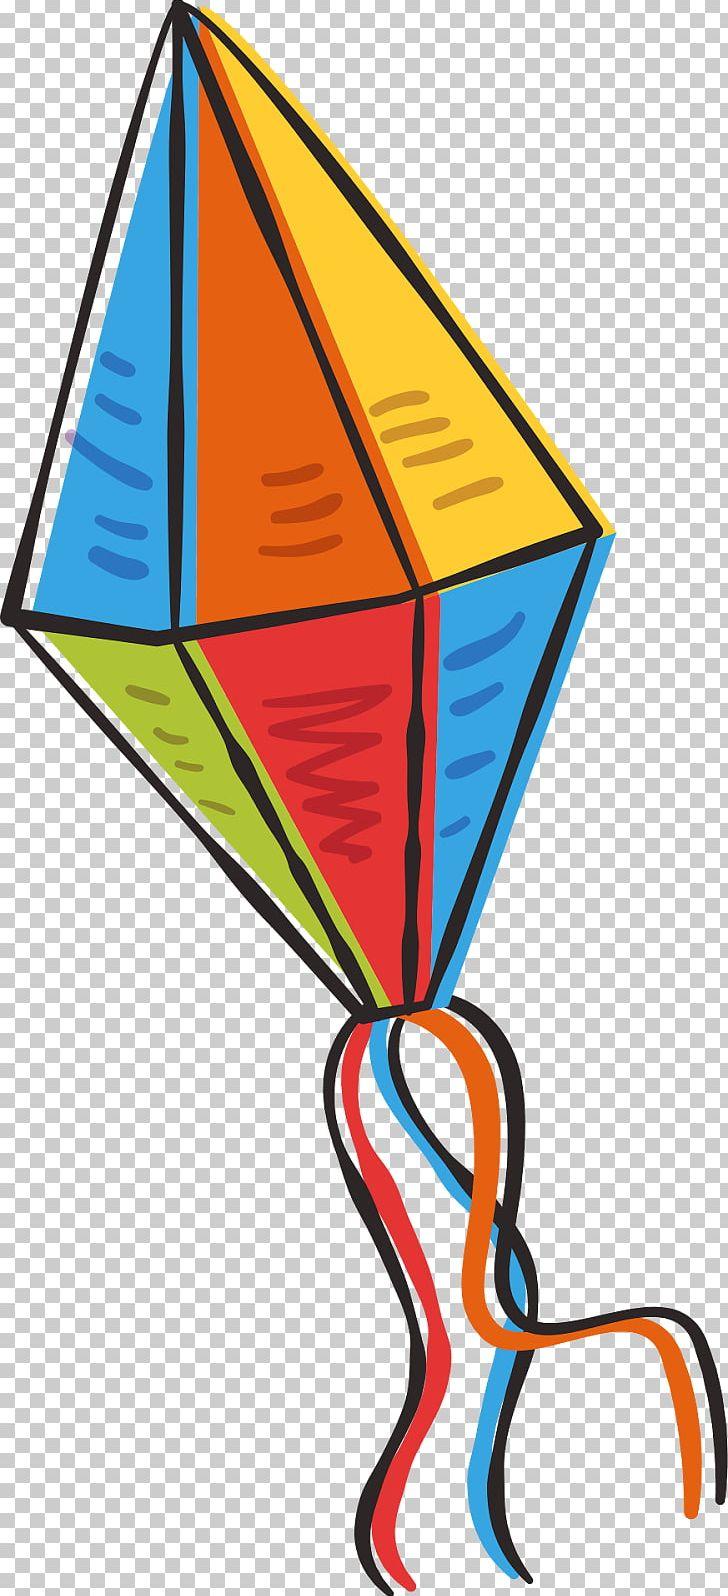 Alban Hefin PNG, Clipart, Alban Hefin, Area, Art Paper, Artwork, Graphic Design Free PNG Download